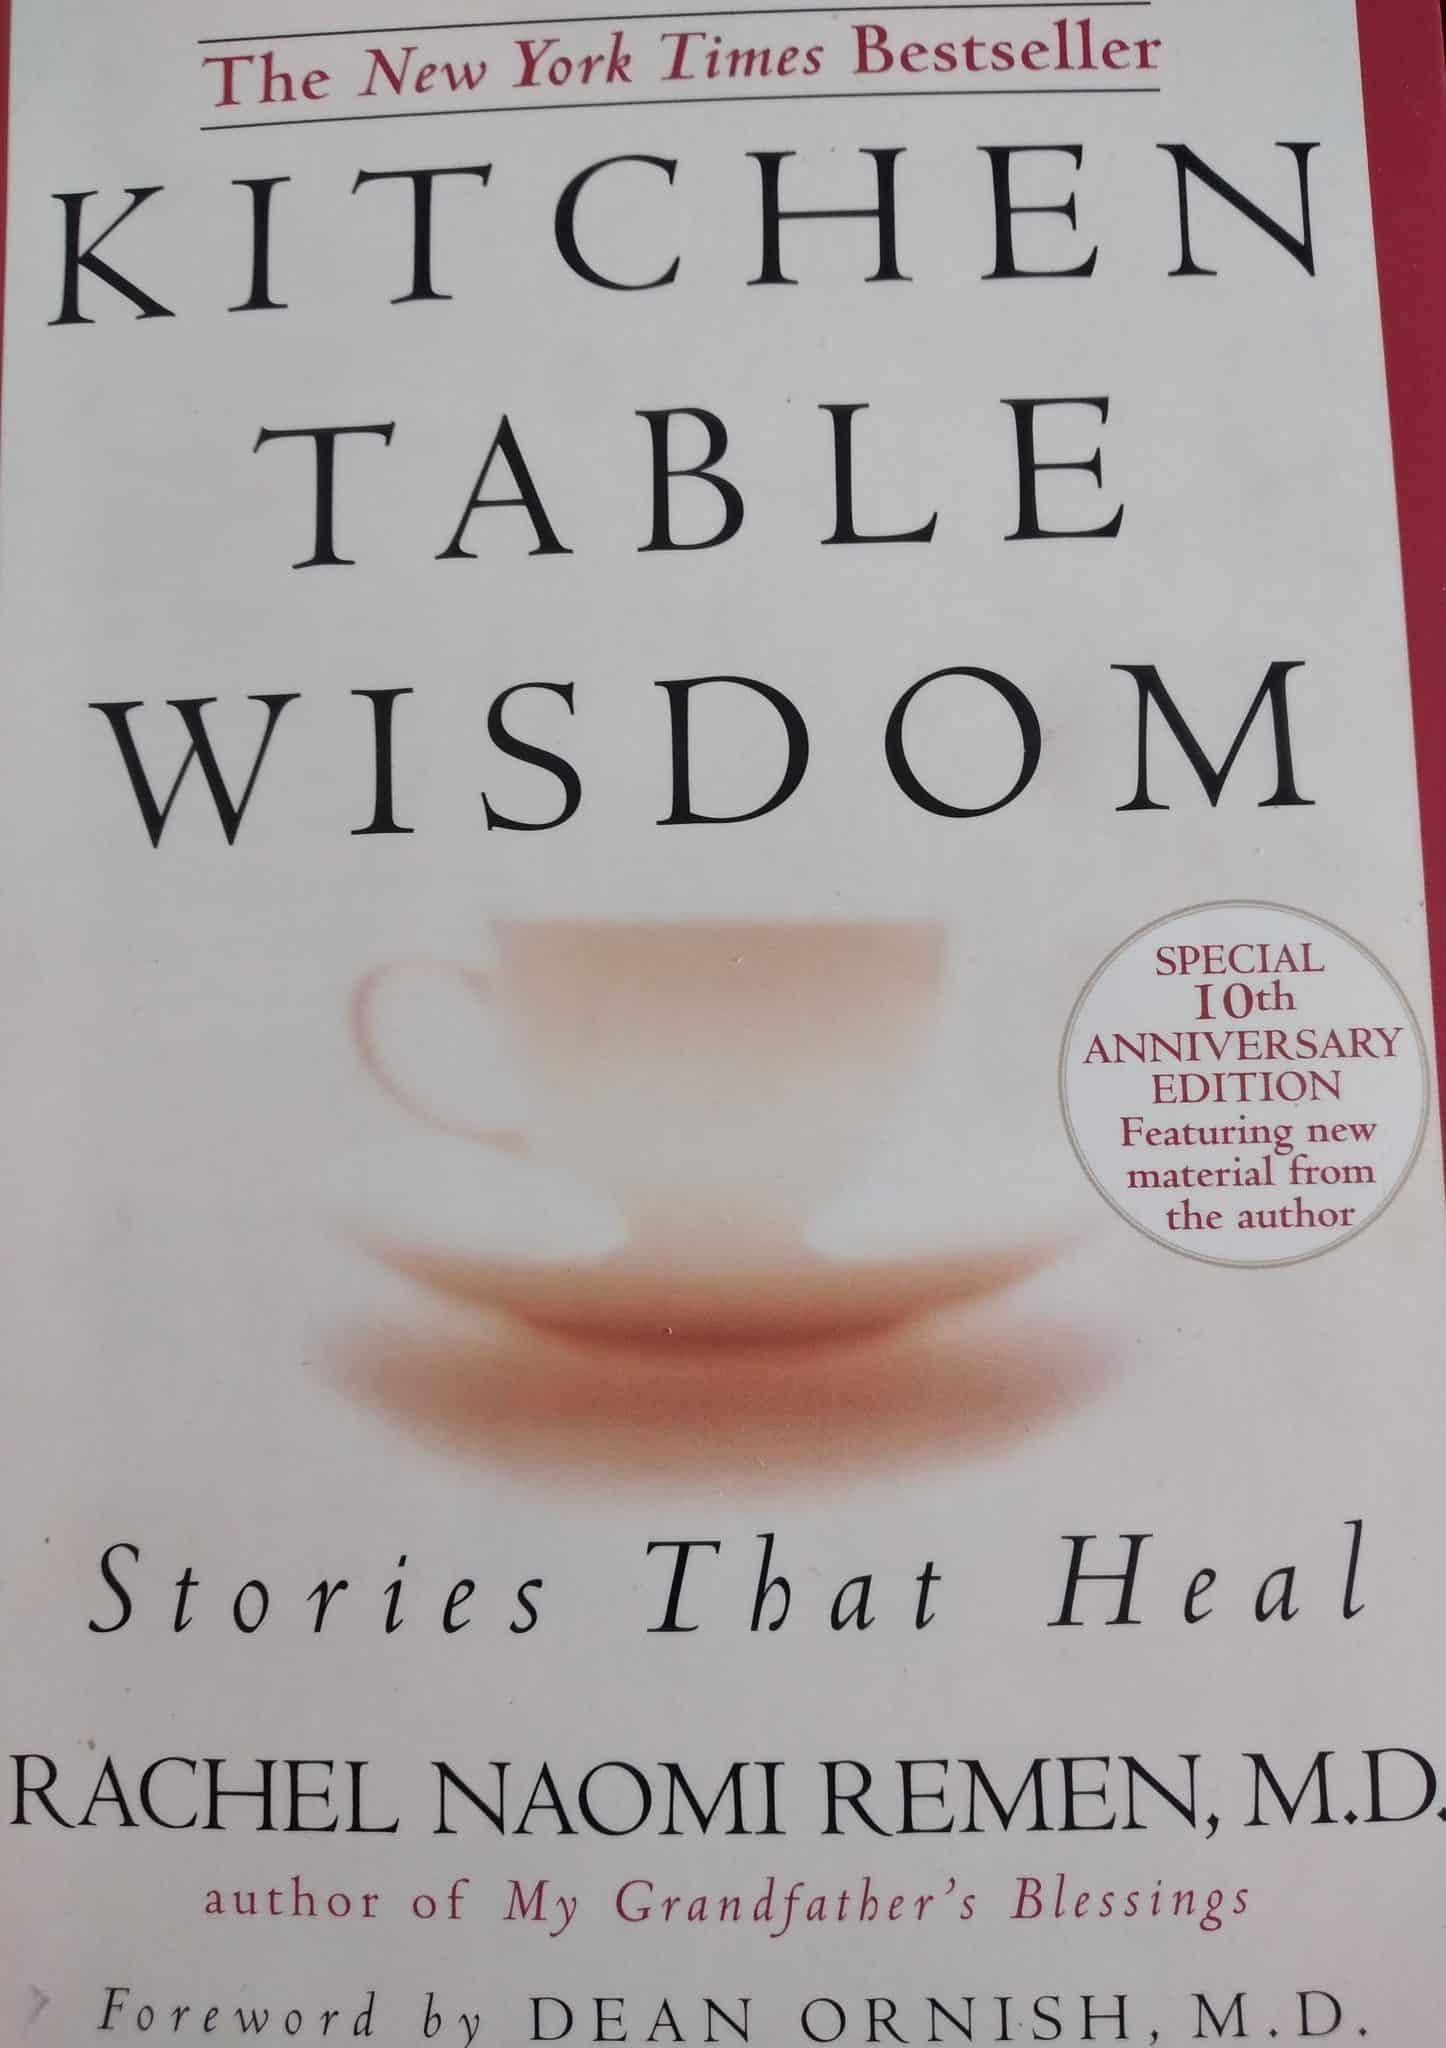 Kitchen Table Wisdom. Stories That Heal